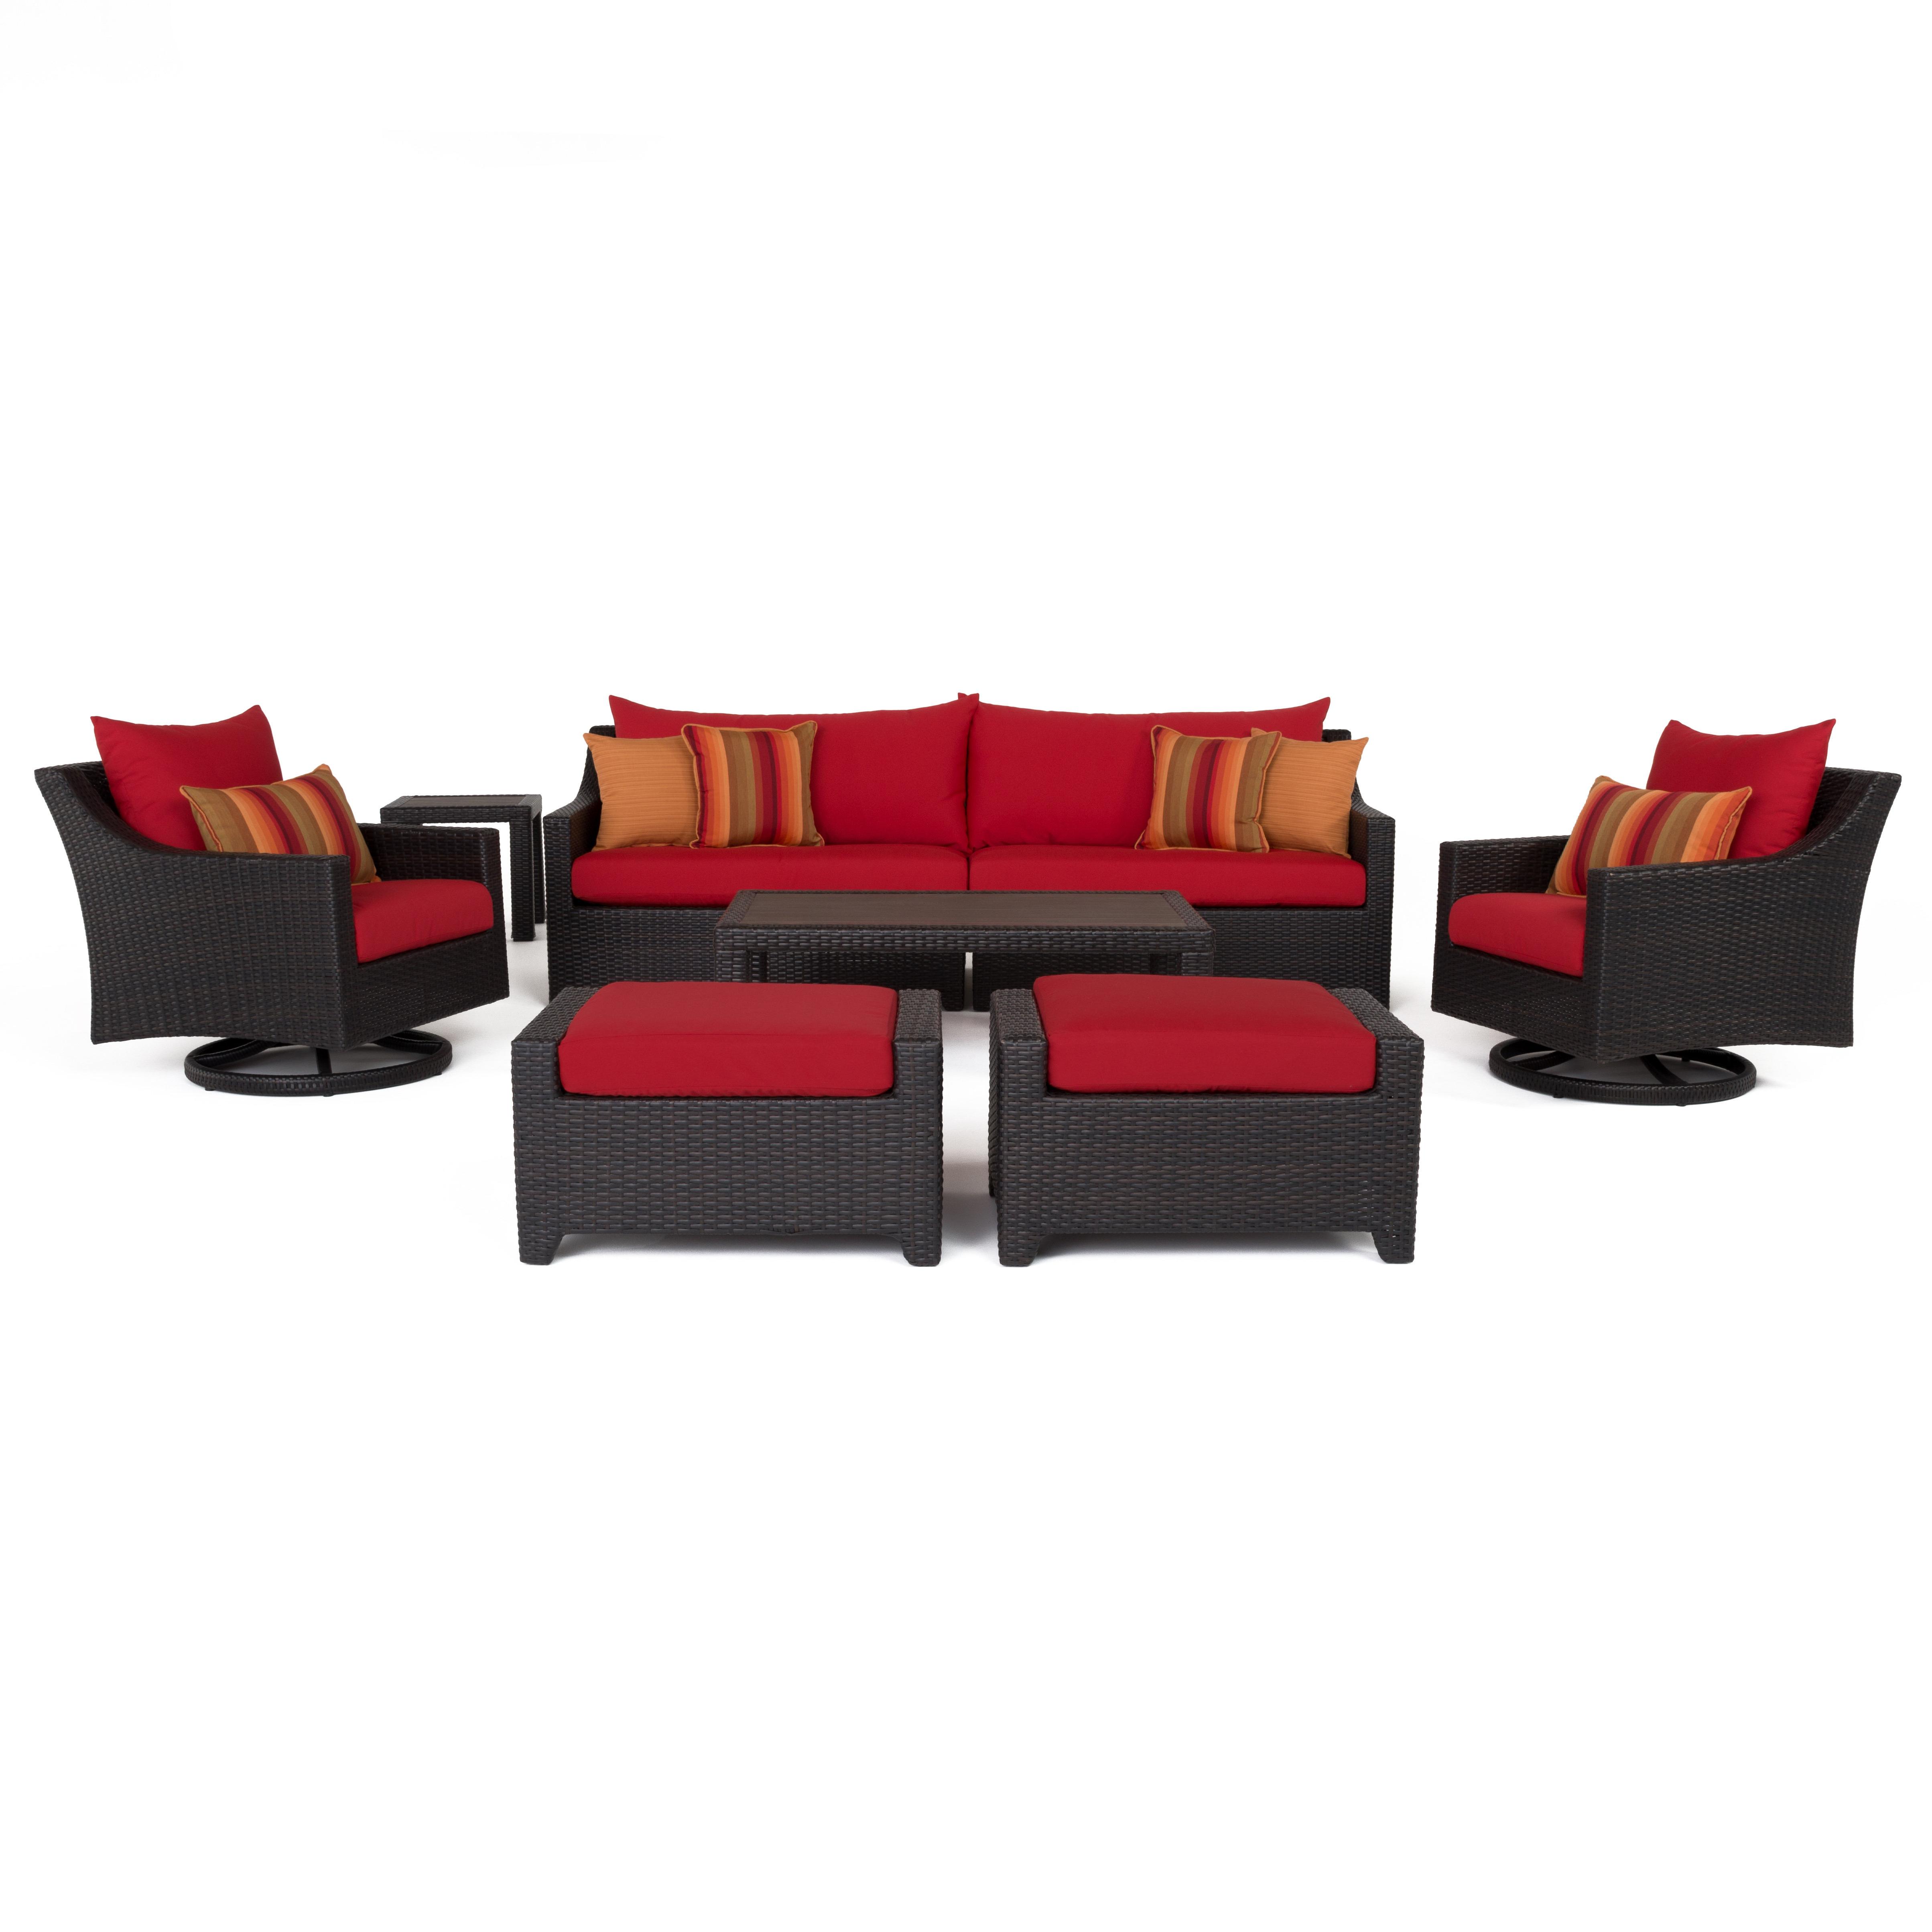 Trendy Northridge 8 Piece Sofa Set With Cushions Inside Northridge Loveseats With Cushions (View 19 of 20)